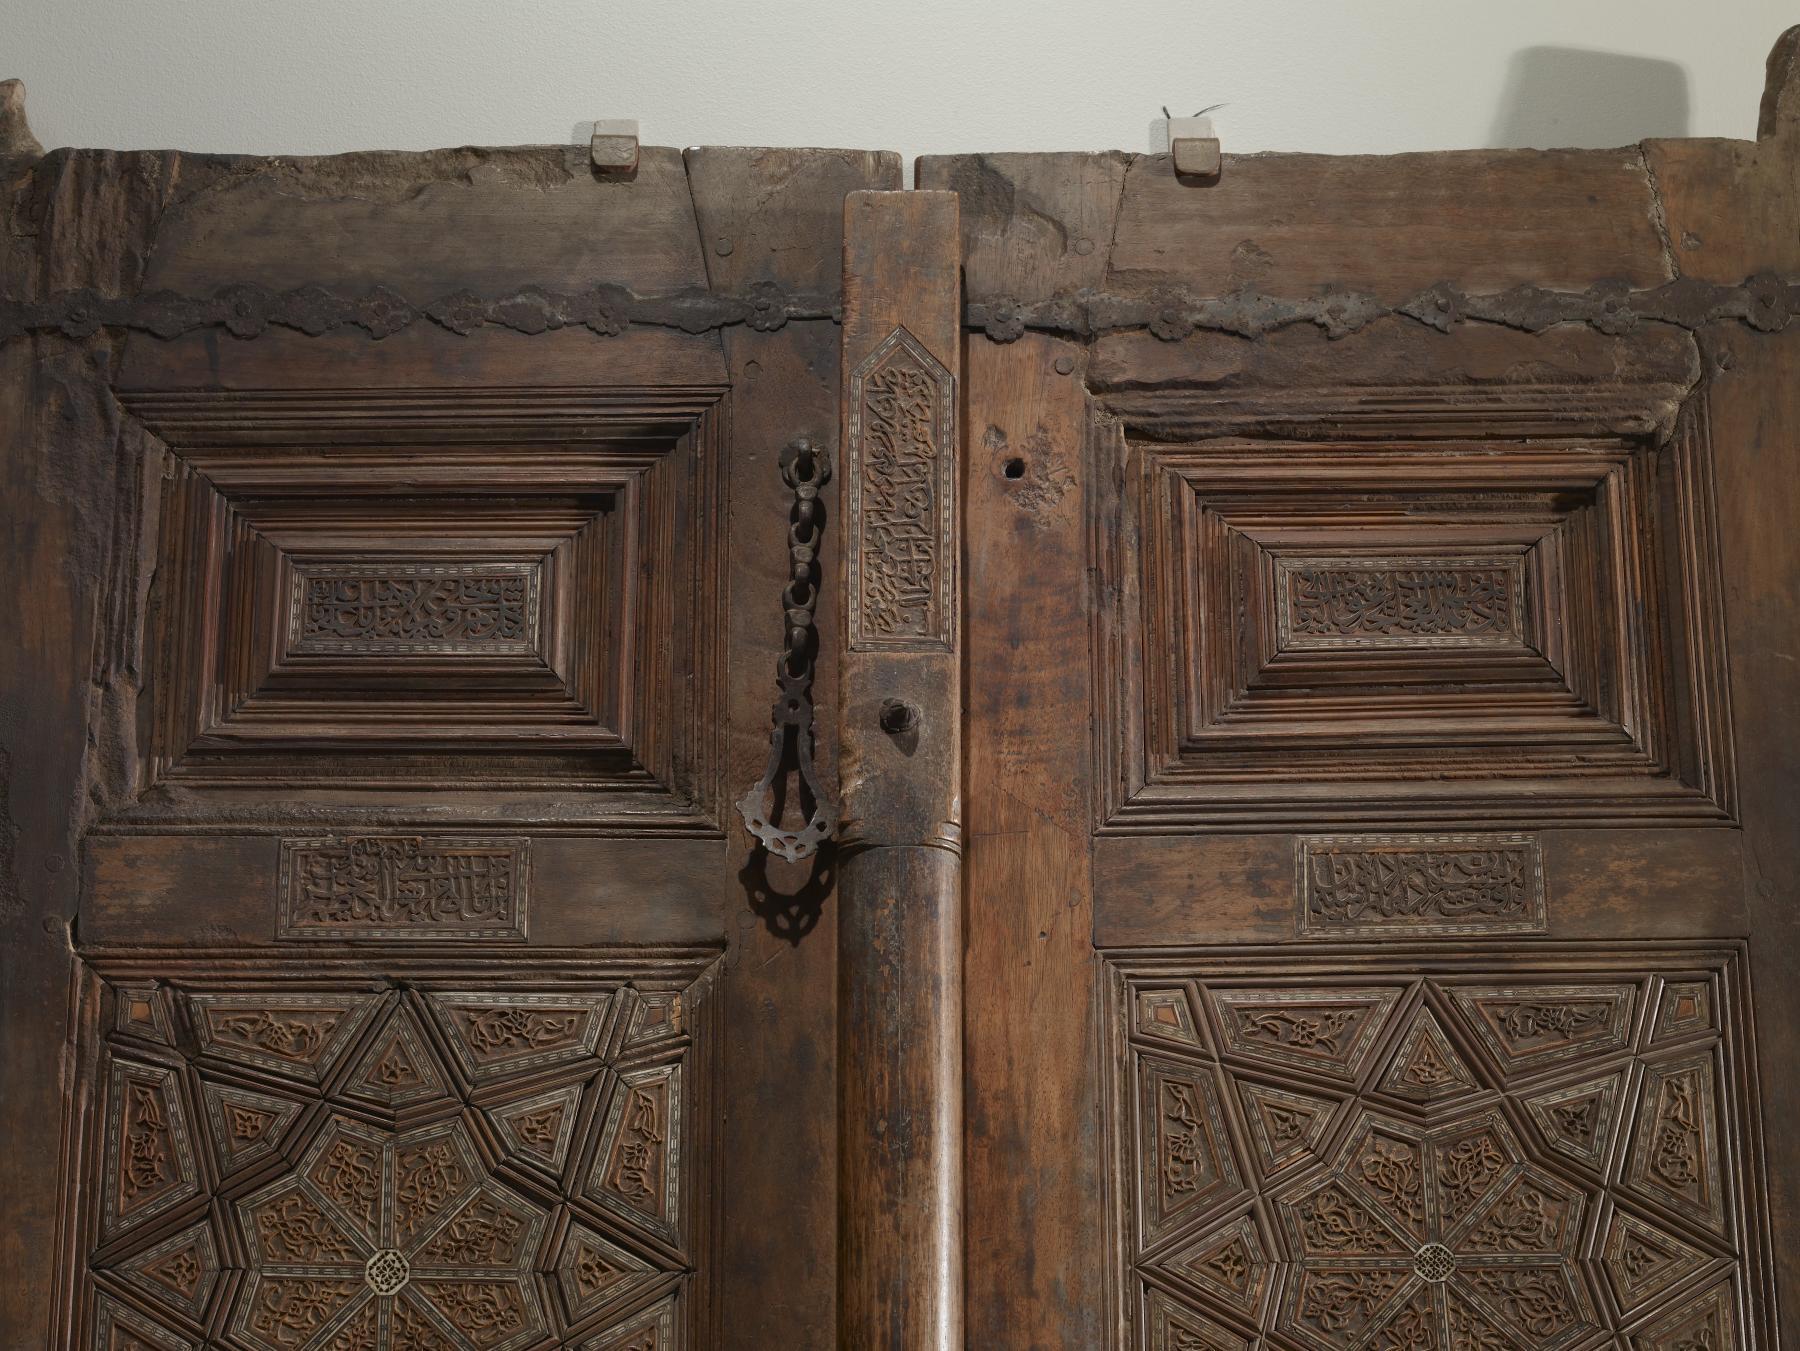 File:Qanbar ibn Mahmud - Mausoleum Doors - Walters 61297 - Detail D.jpg & File:Qanbar ibn Mahmud - Mausoleum Doors - Walters 61297 - Detail ... Pezcame.Com